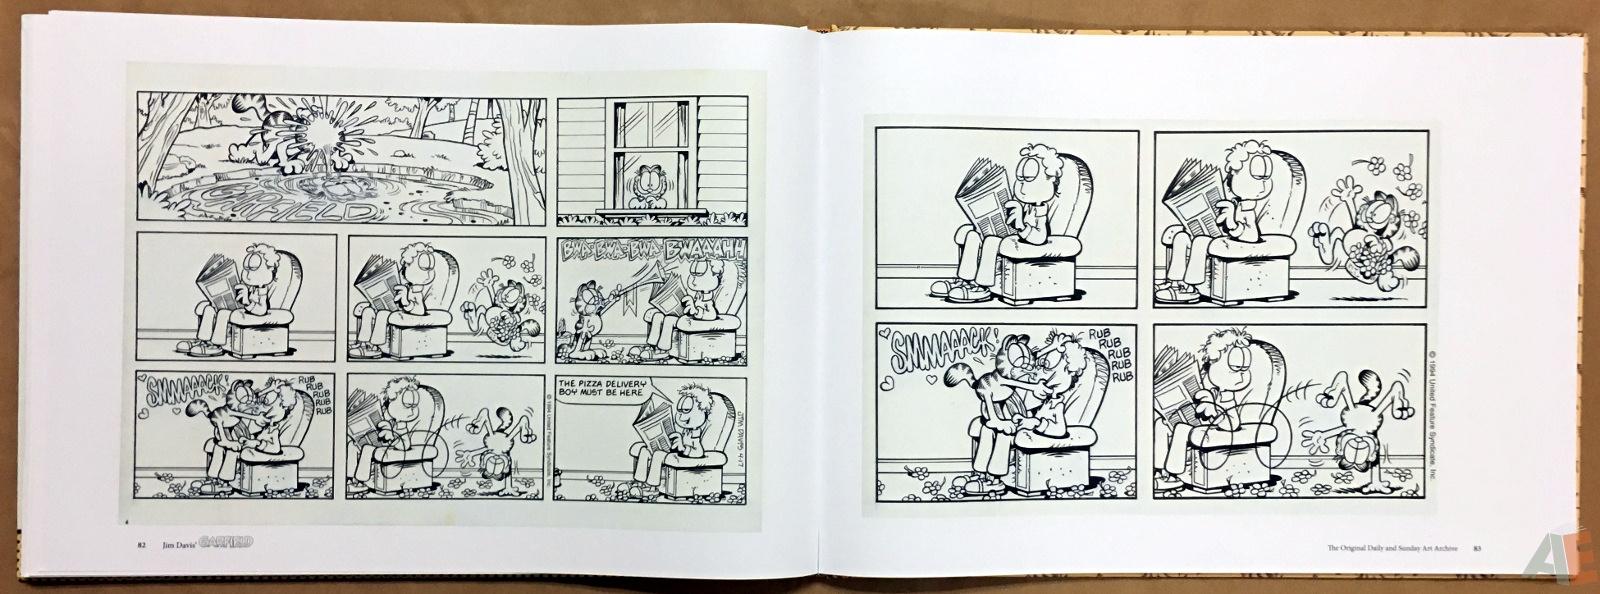 Jim Davis' Garfield: The Original Daily and Sunday Art Archive